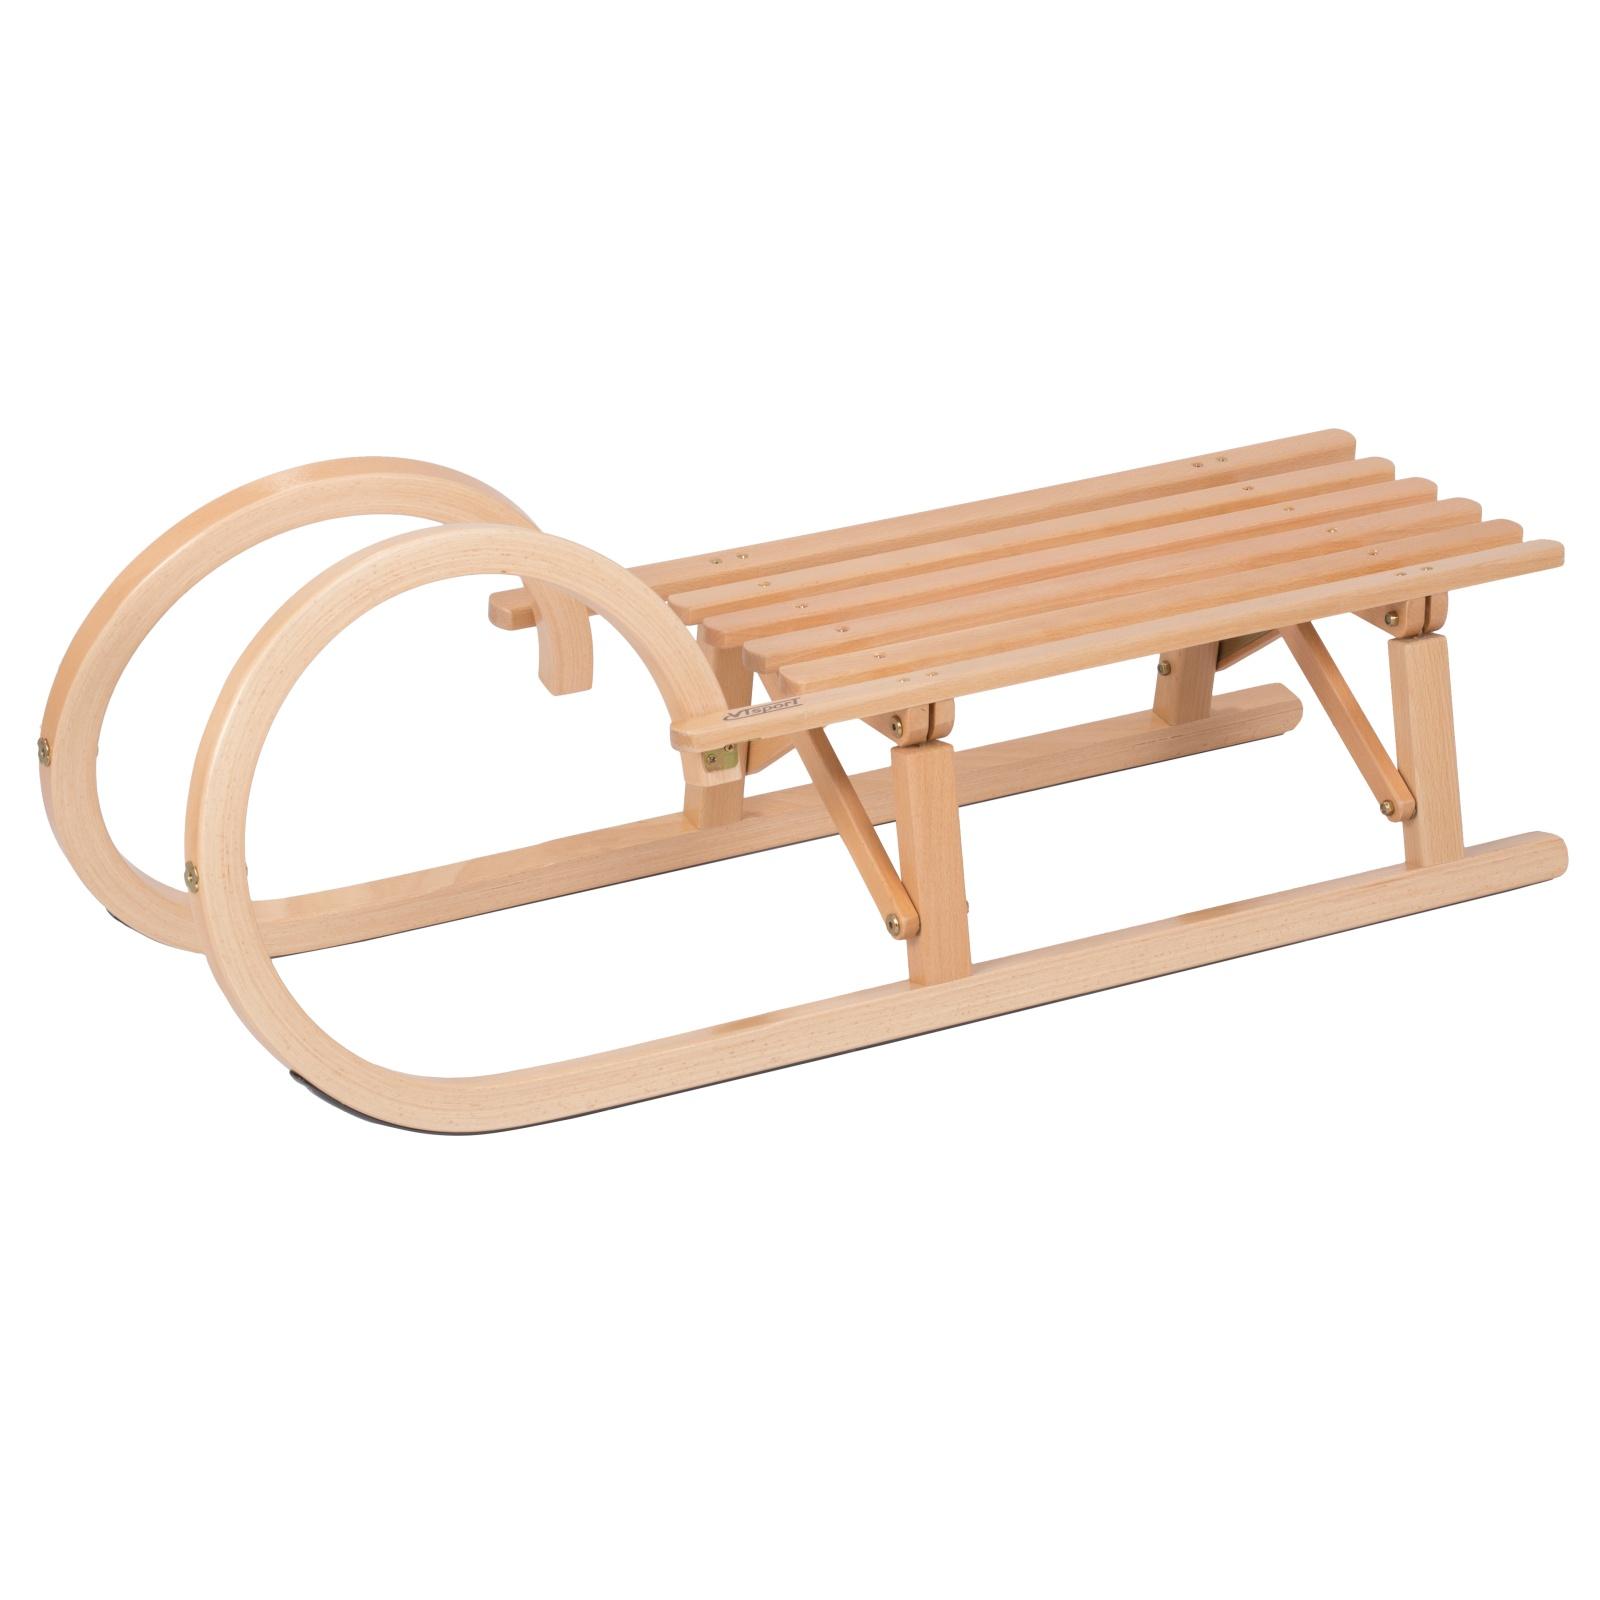 Sane drevené VT-SPORT Rohačky diaľka 100 cm - skladacie